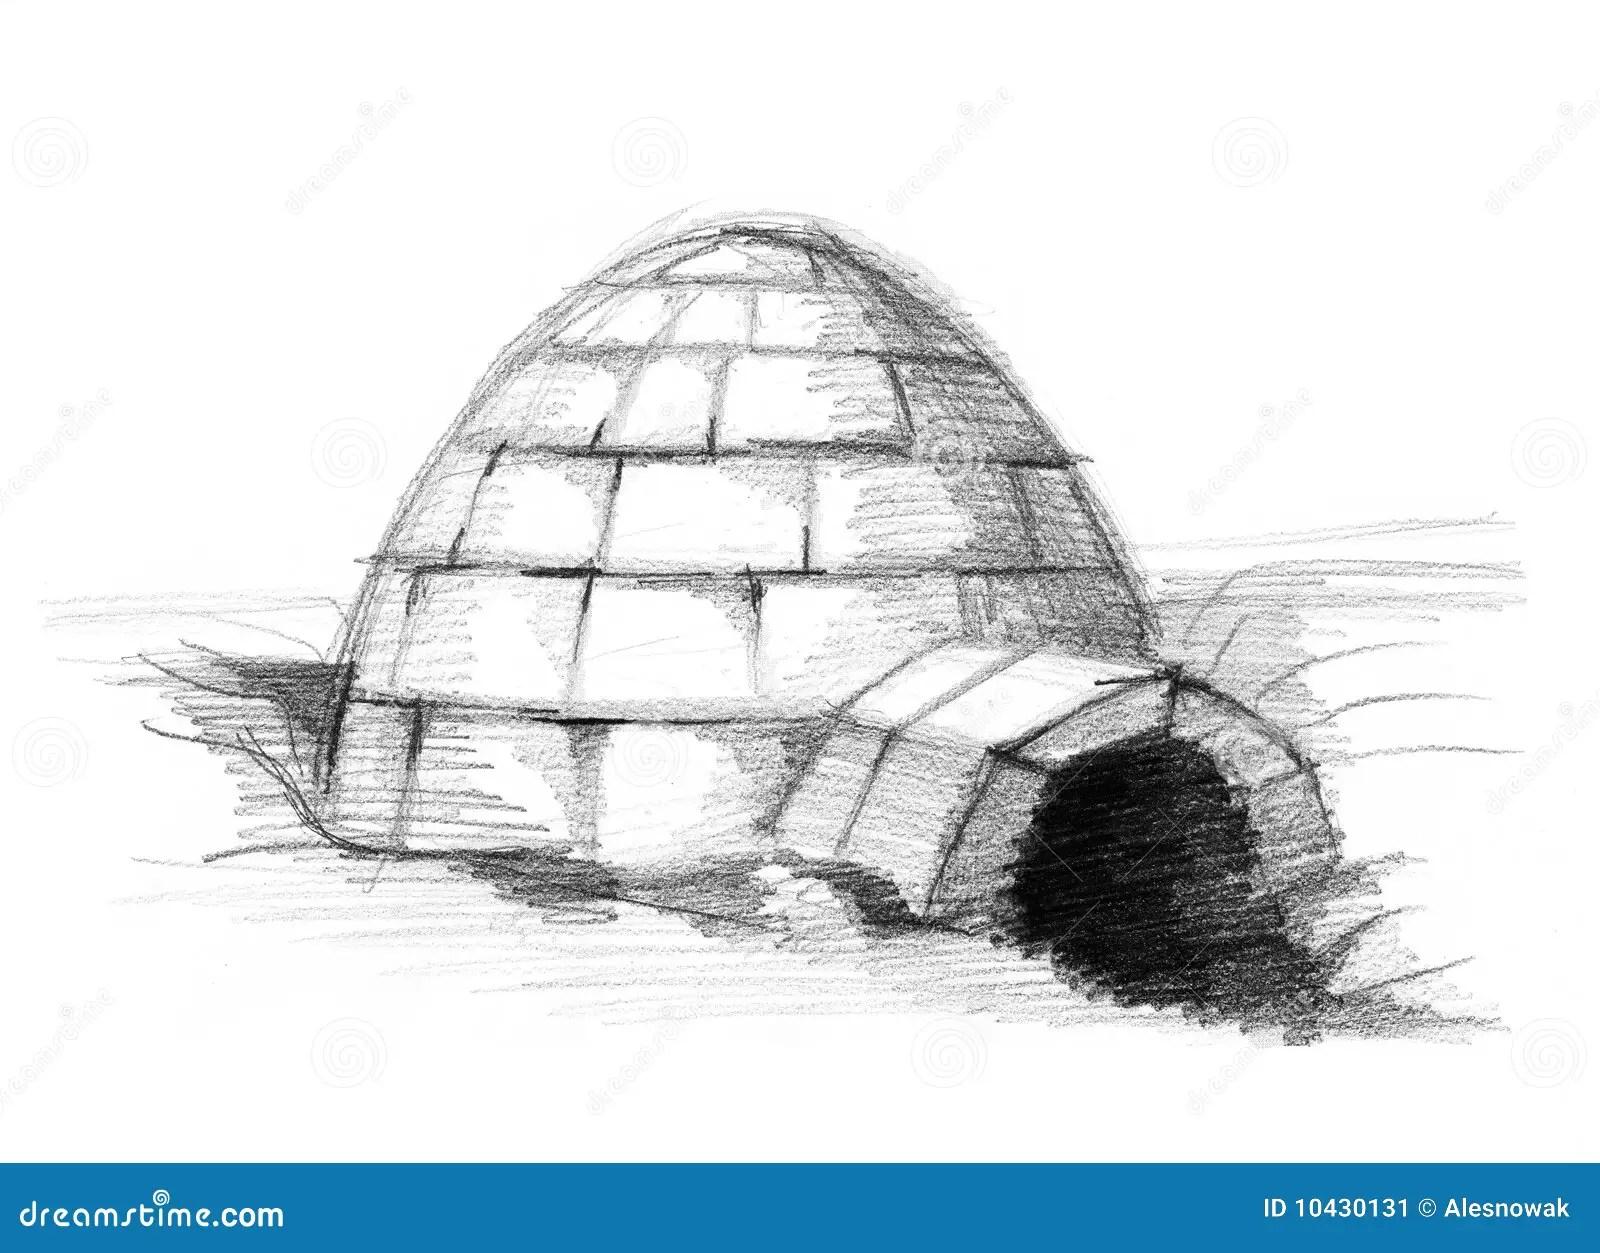 Eskimo Igloo Stock Image